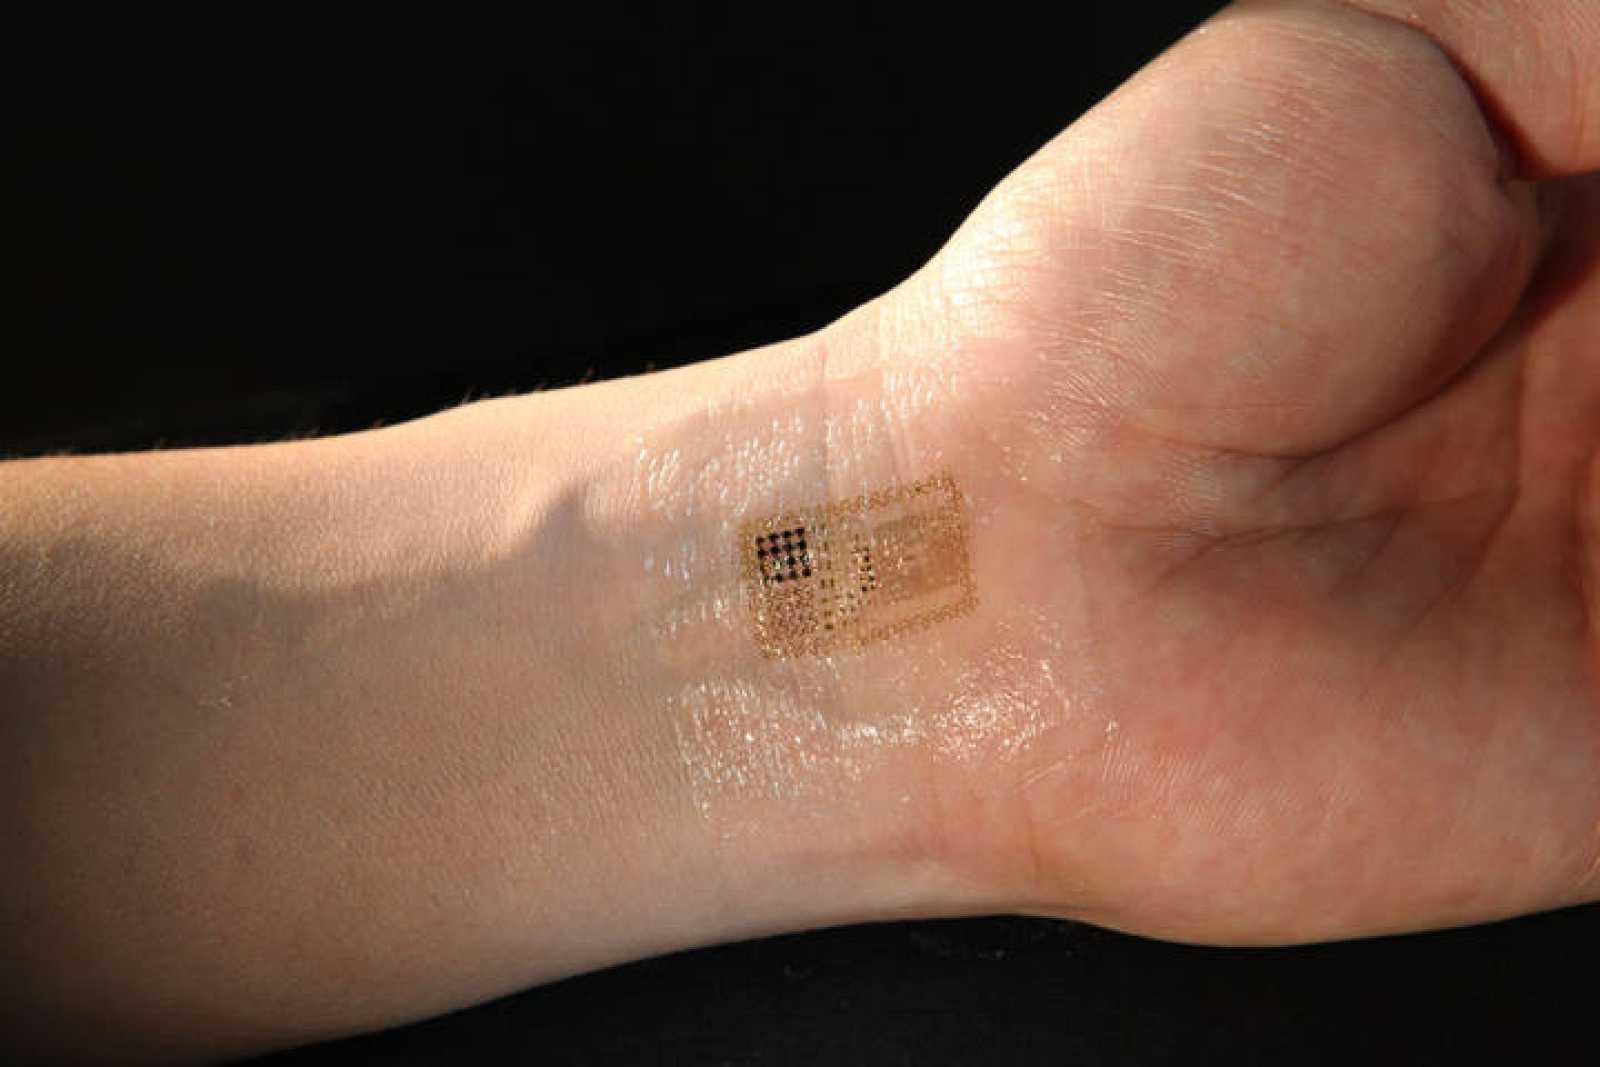 Un tatuaje que monitoriza las constantes vitales